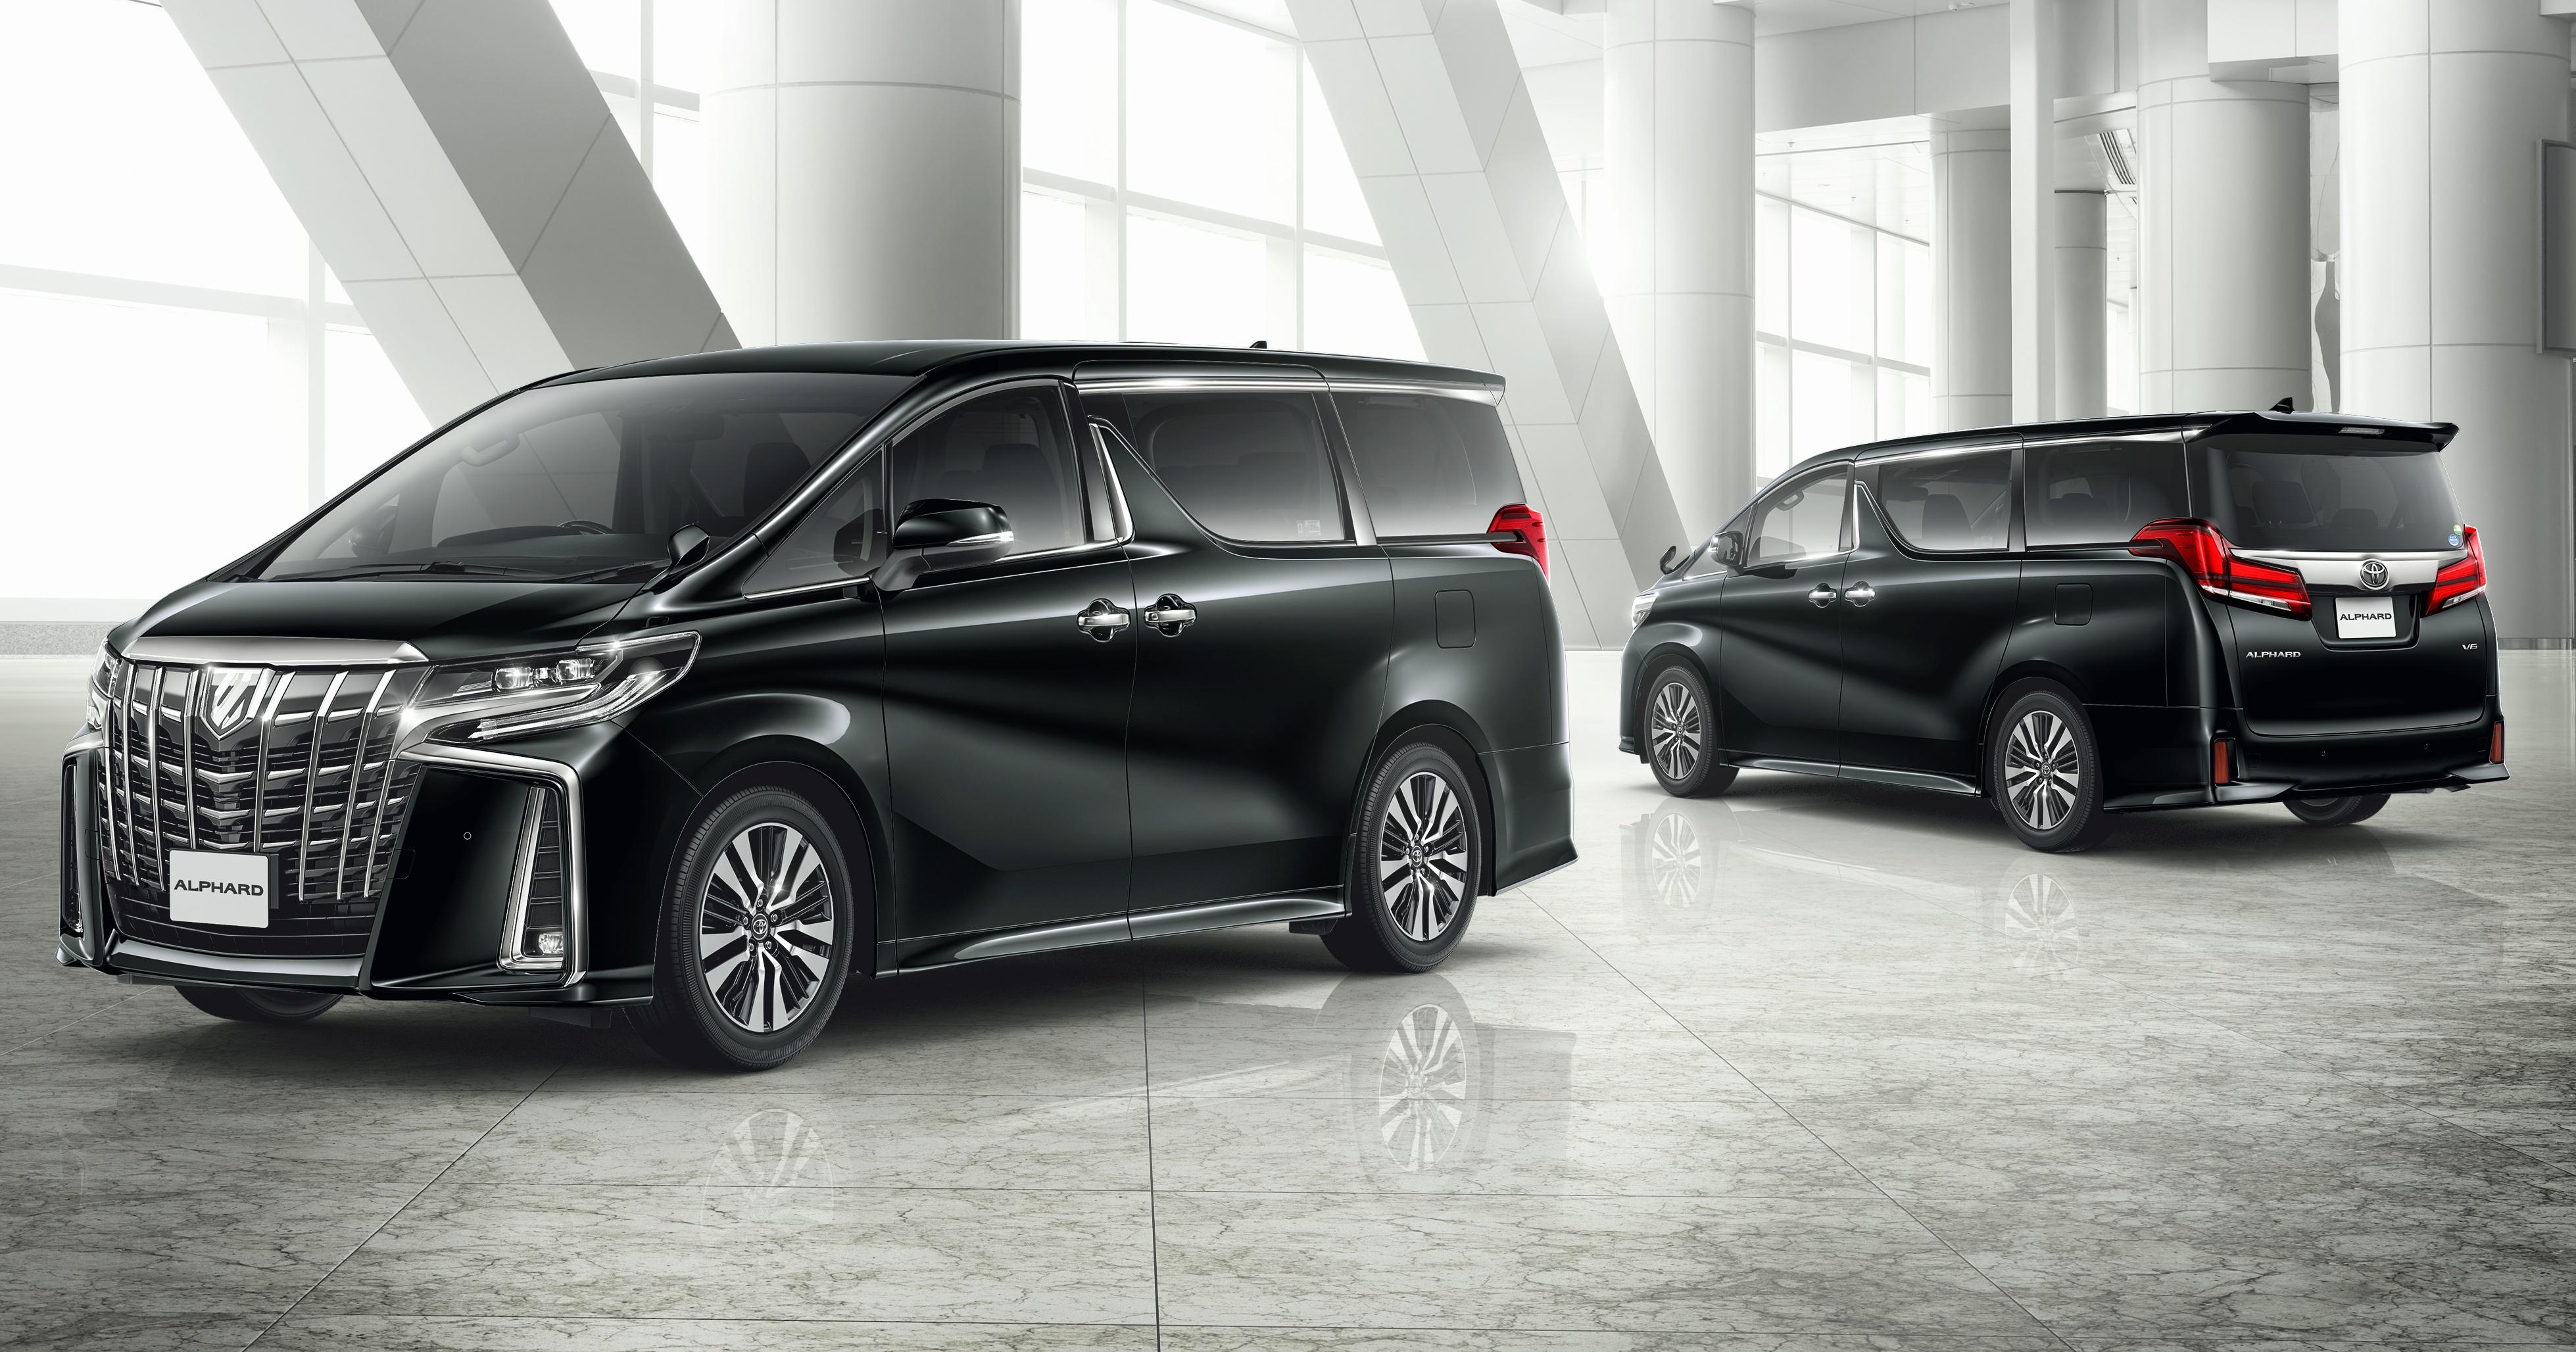 日本发布小改款 Toyota Alphard 与 Vellfire,搭载全新 3 5l V6 自然进气引擎,8at